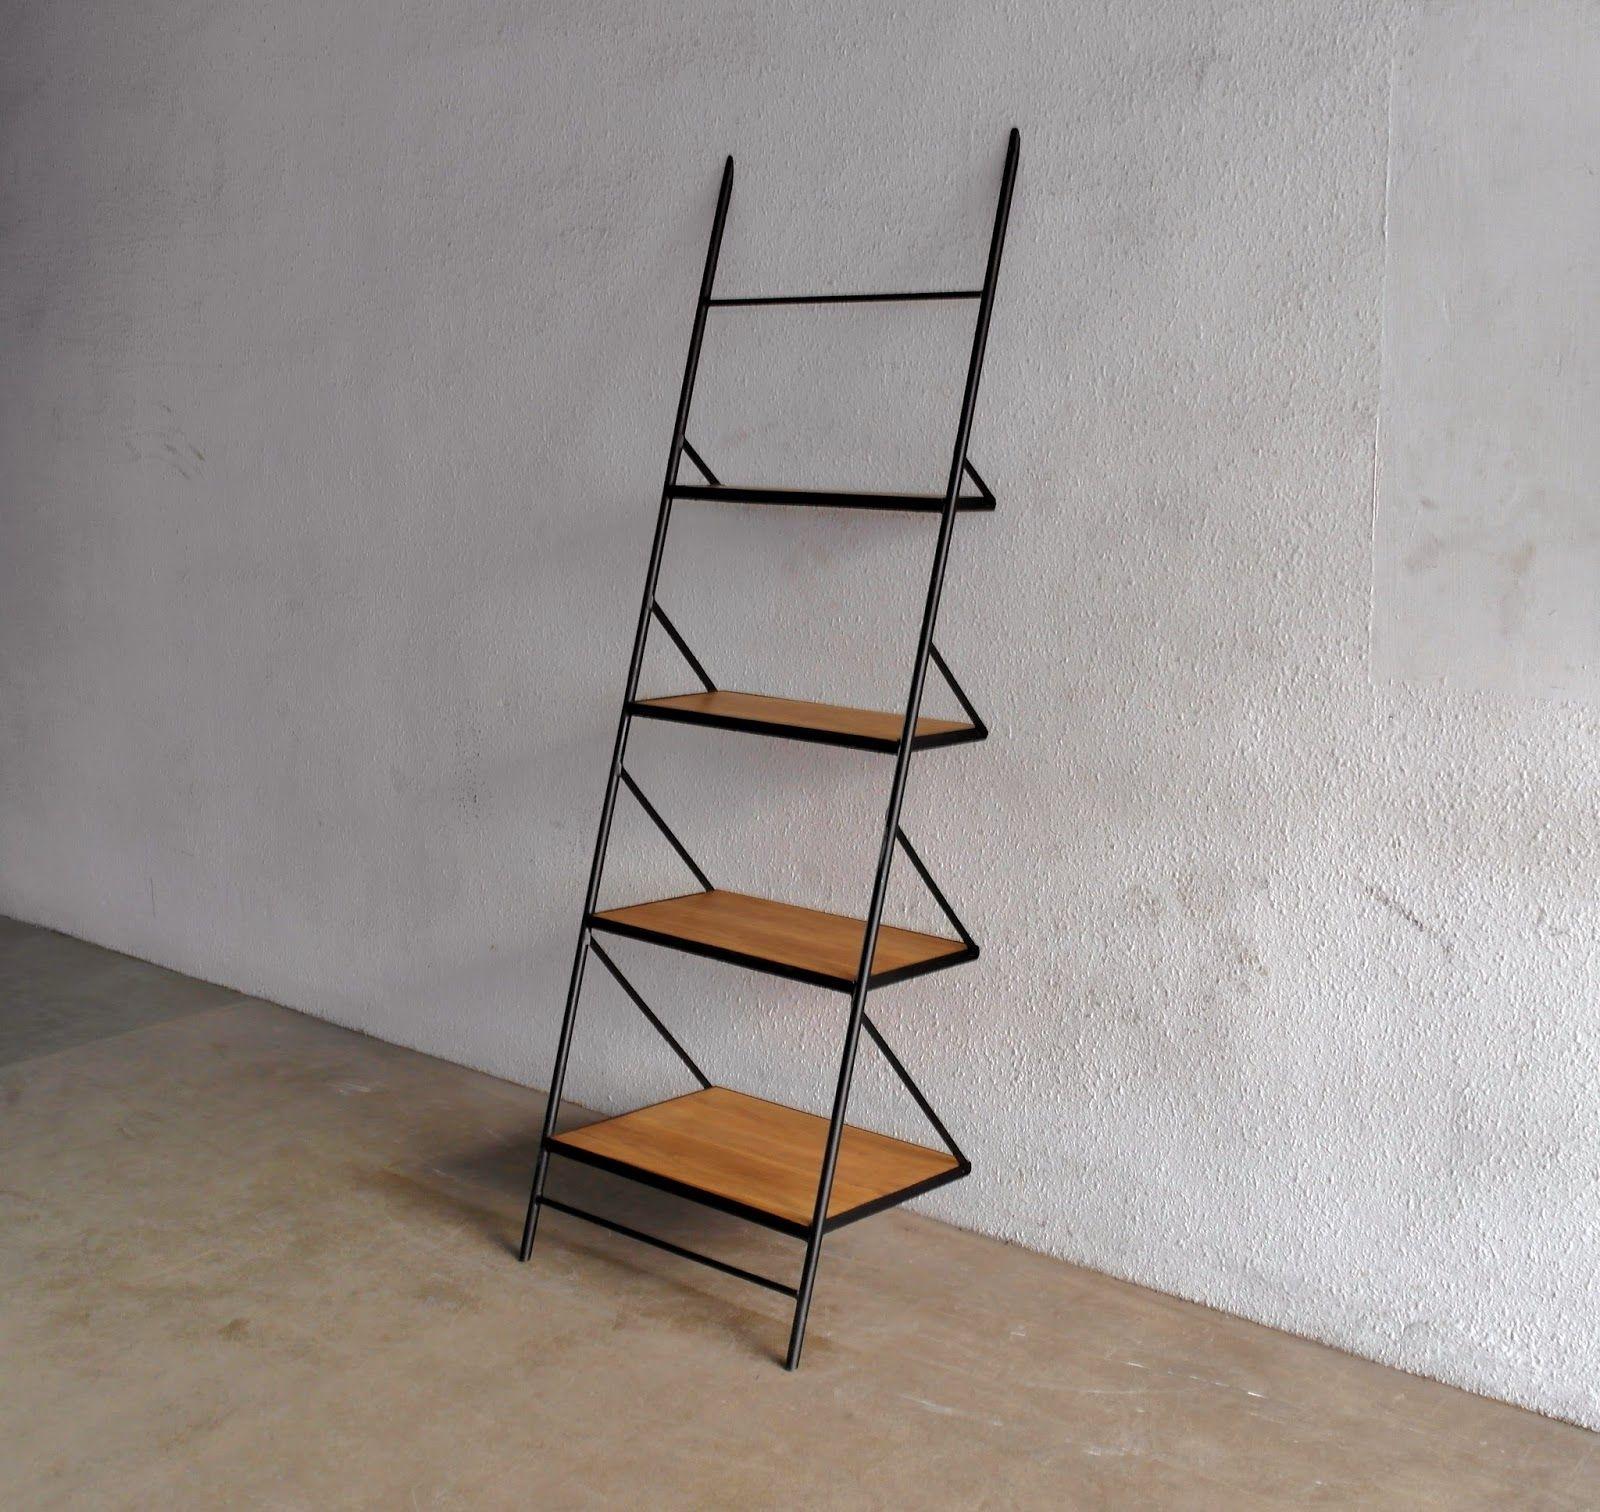 Pin By Sophan Basir On Living Room Ideas Wood Ladder Shelf